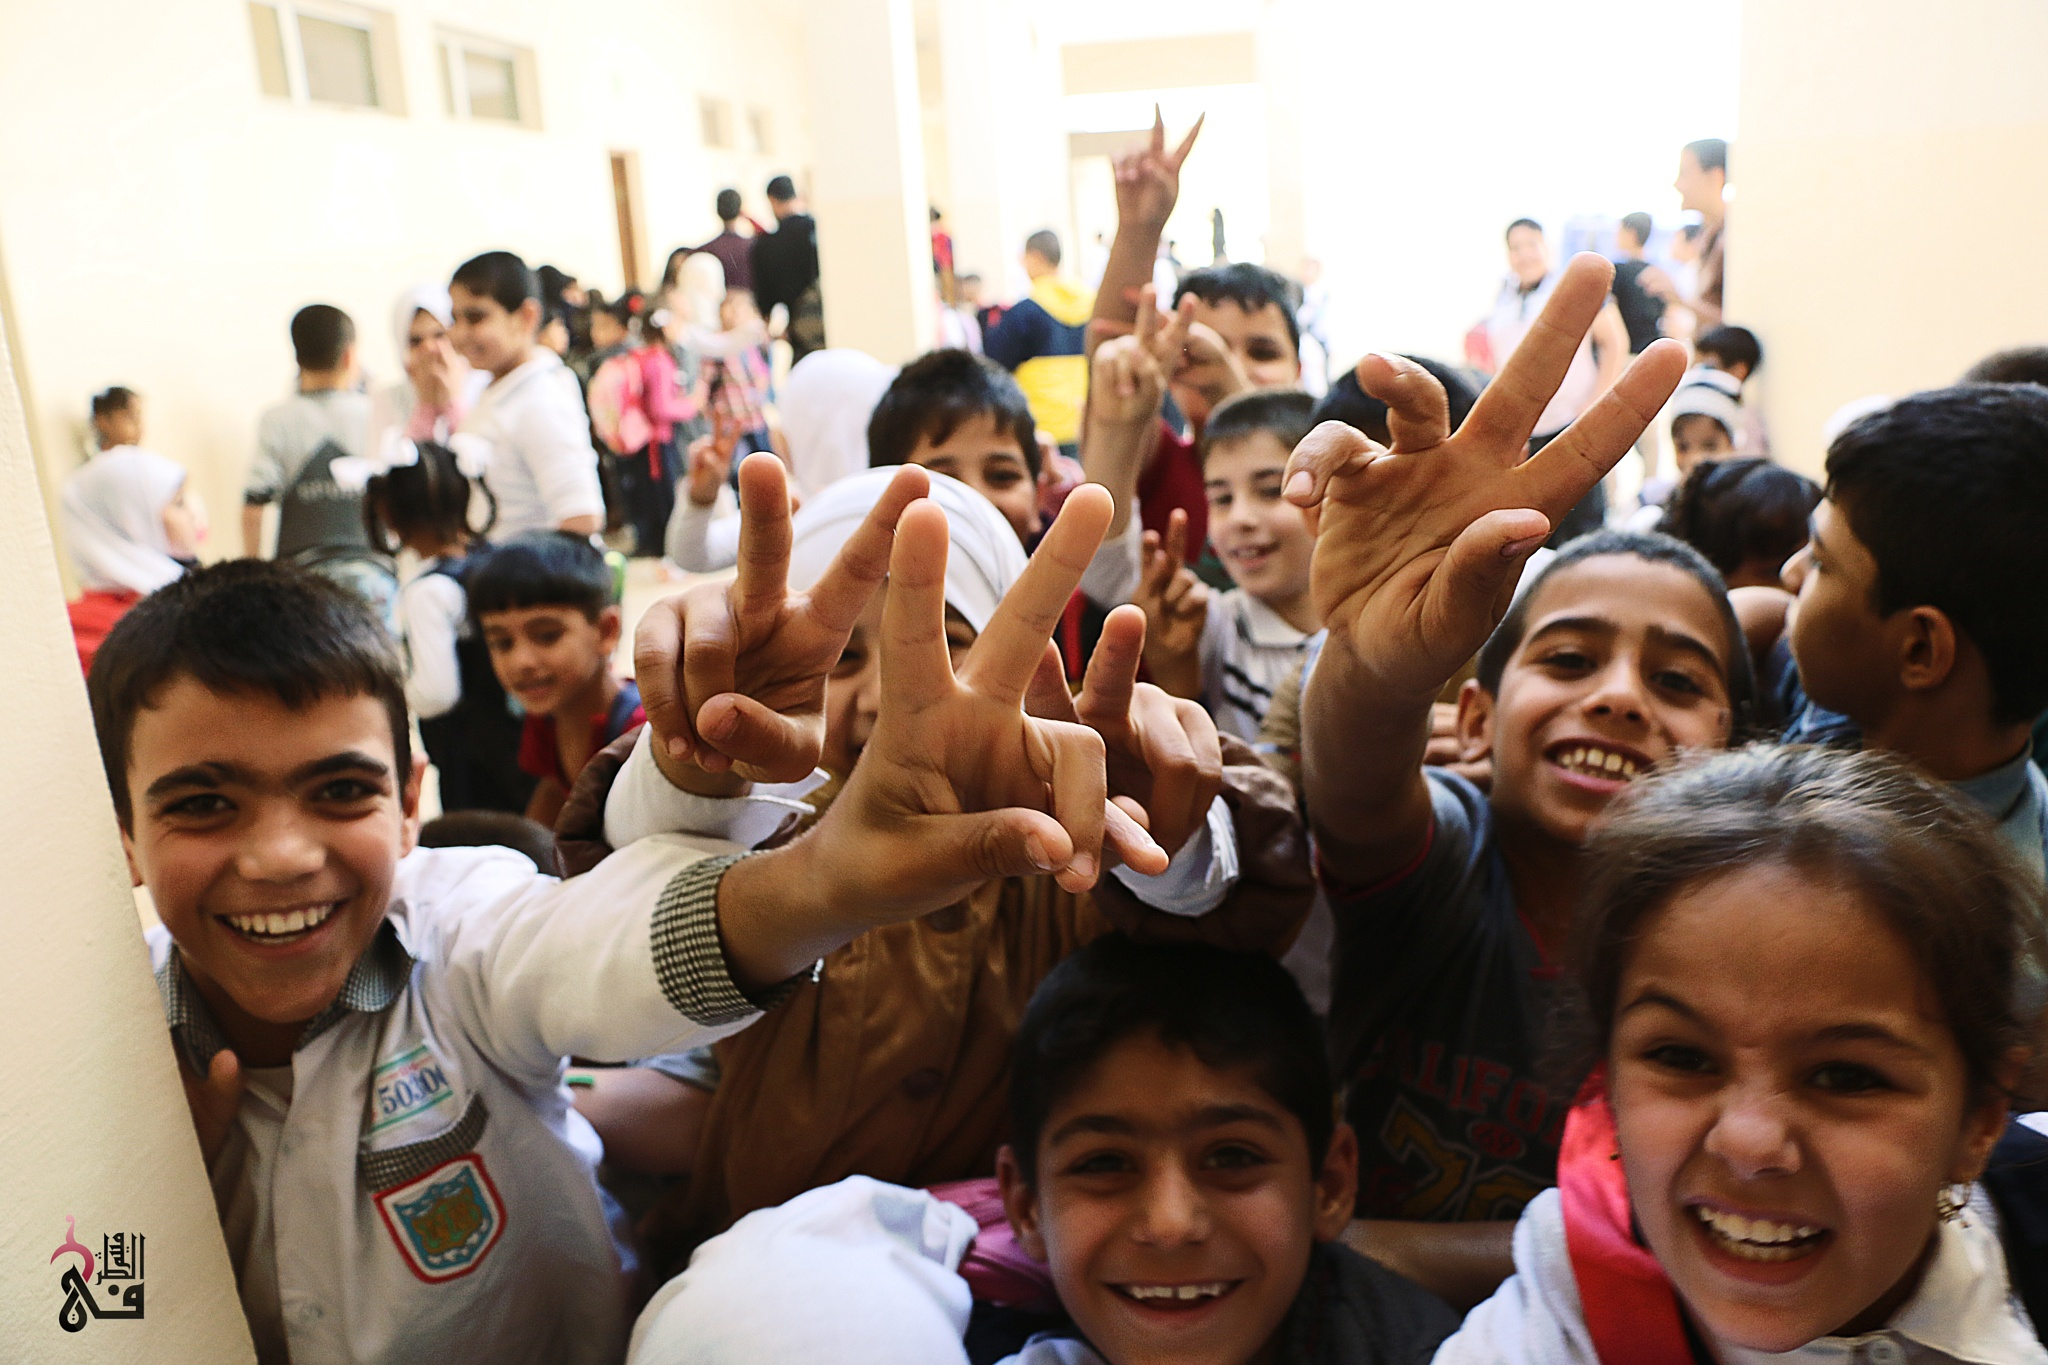 Children displaced from areas occupied by ISIS in Iraq/الاطفال النازحين من المناطق التي احتلها داعش  by maithamturfi